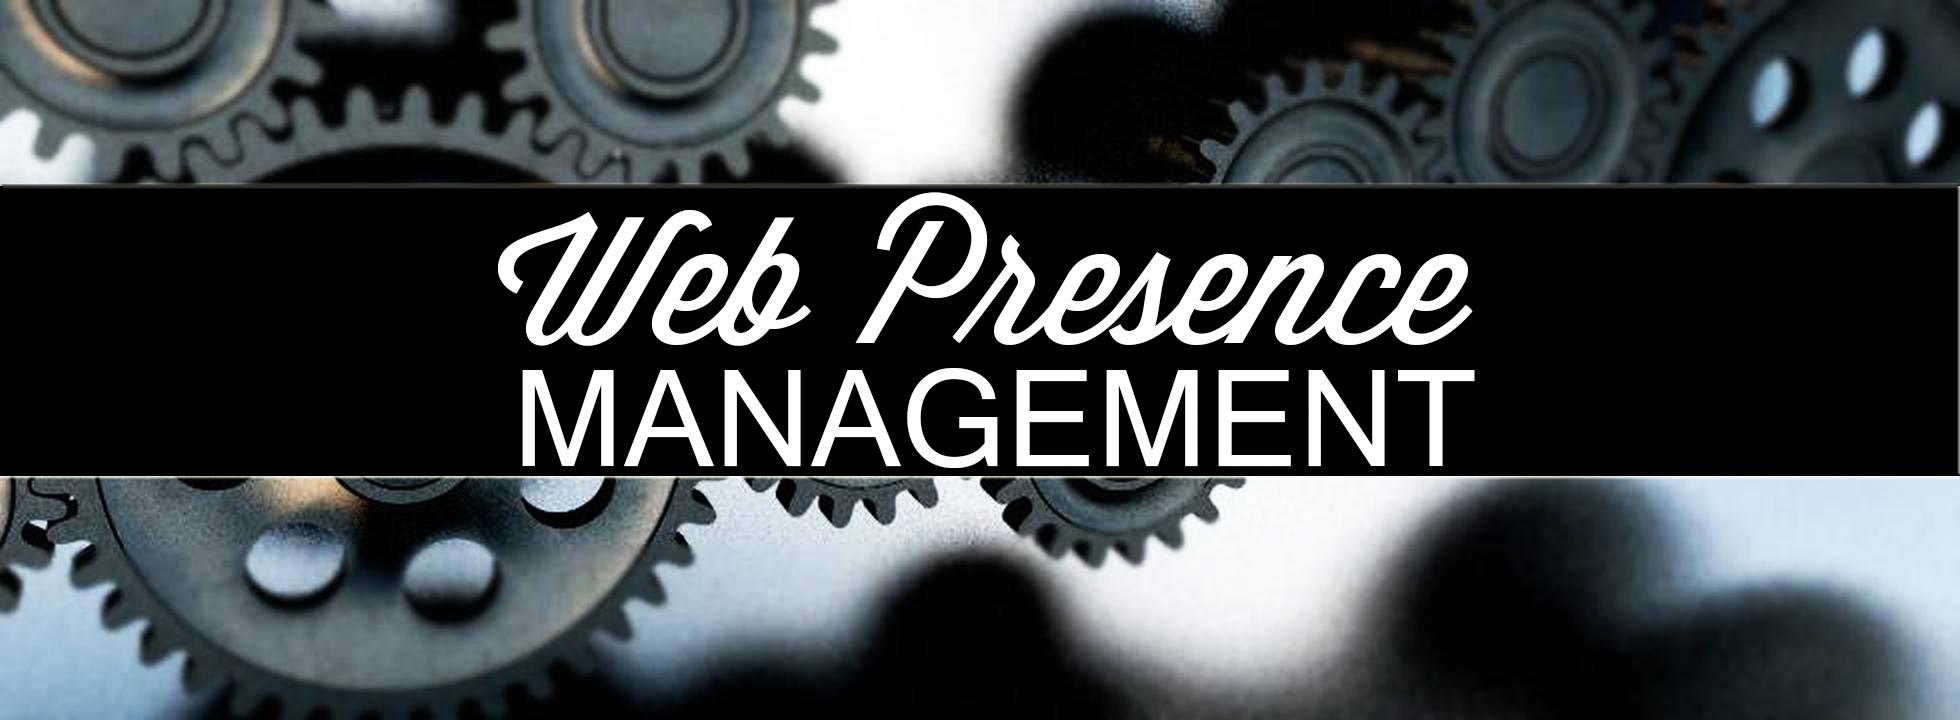 Essential Information on Web Presence Management # WebPresenceManagement  http://www.thewebhandlers.com/web-presence-management-essential/